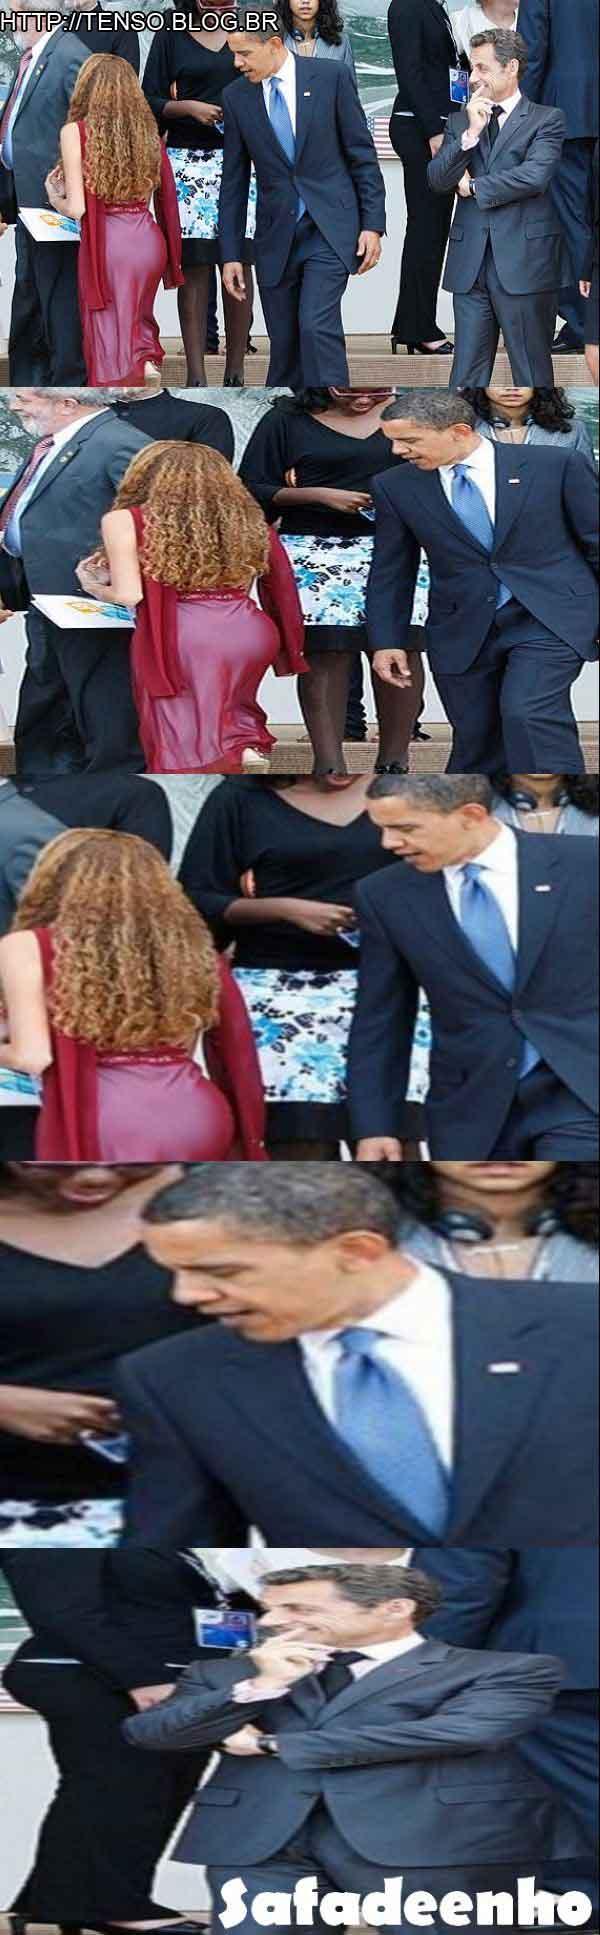 obama_tenso